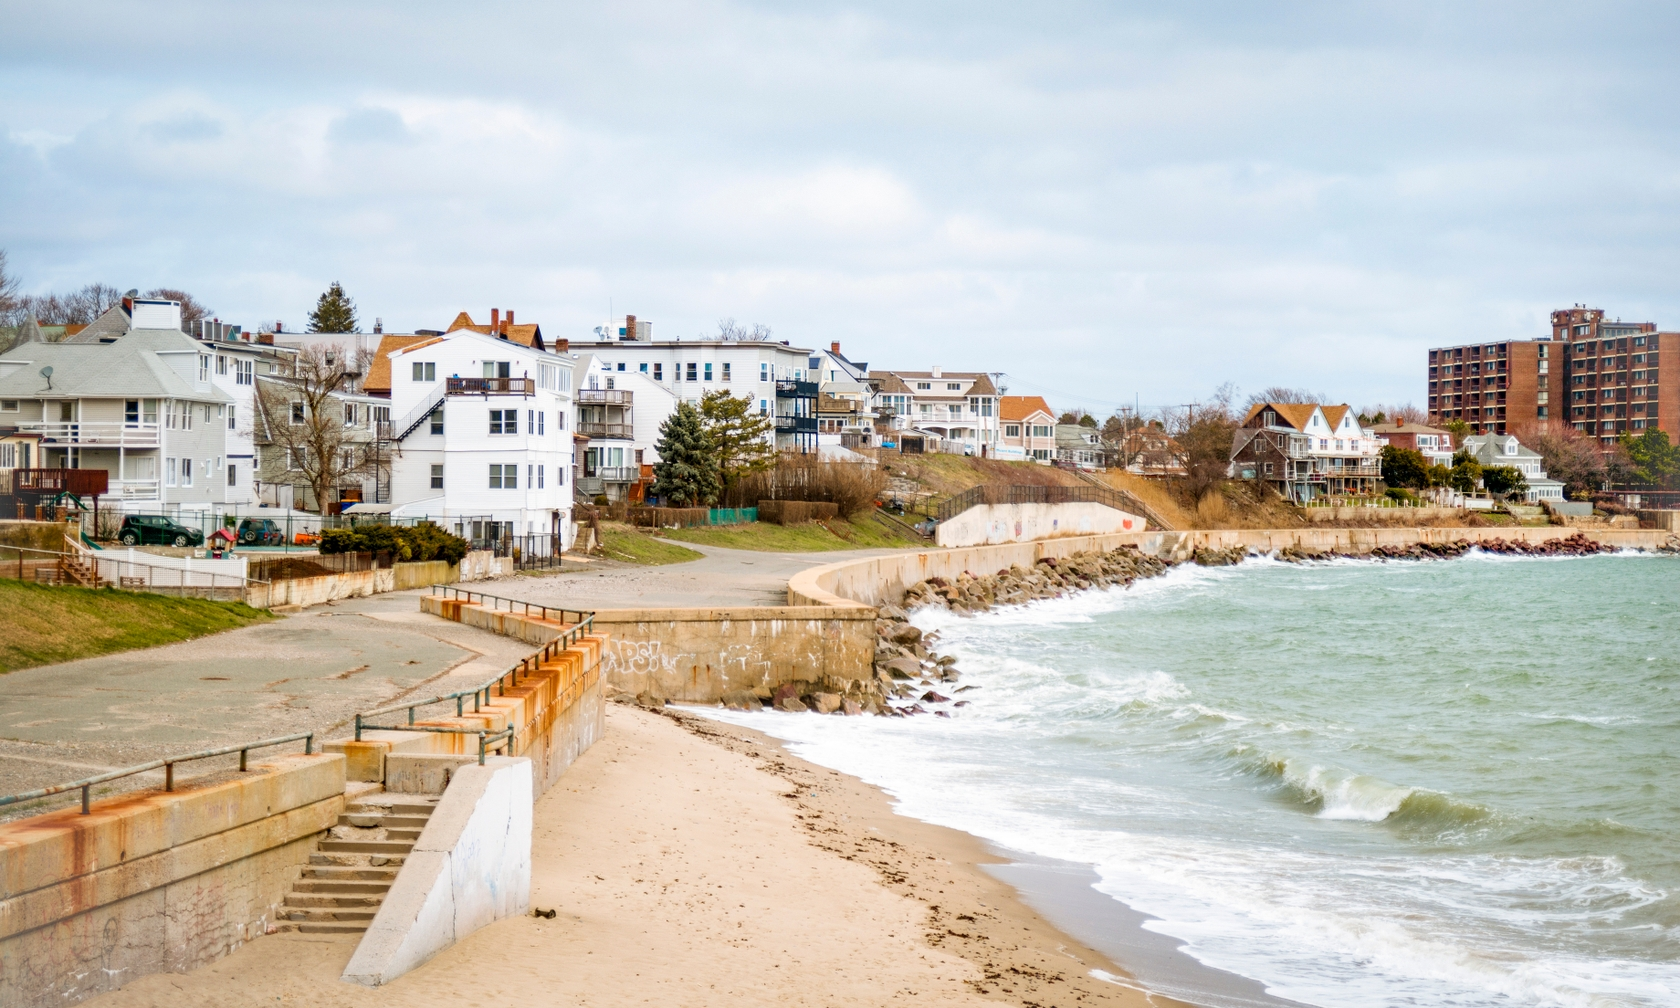 Vacation rentals in Massachusetts